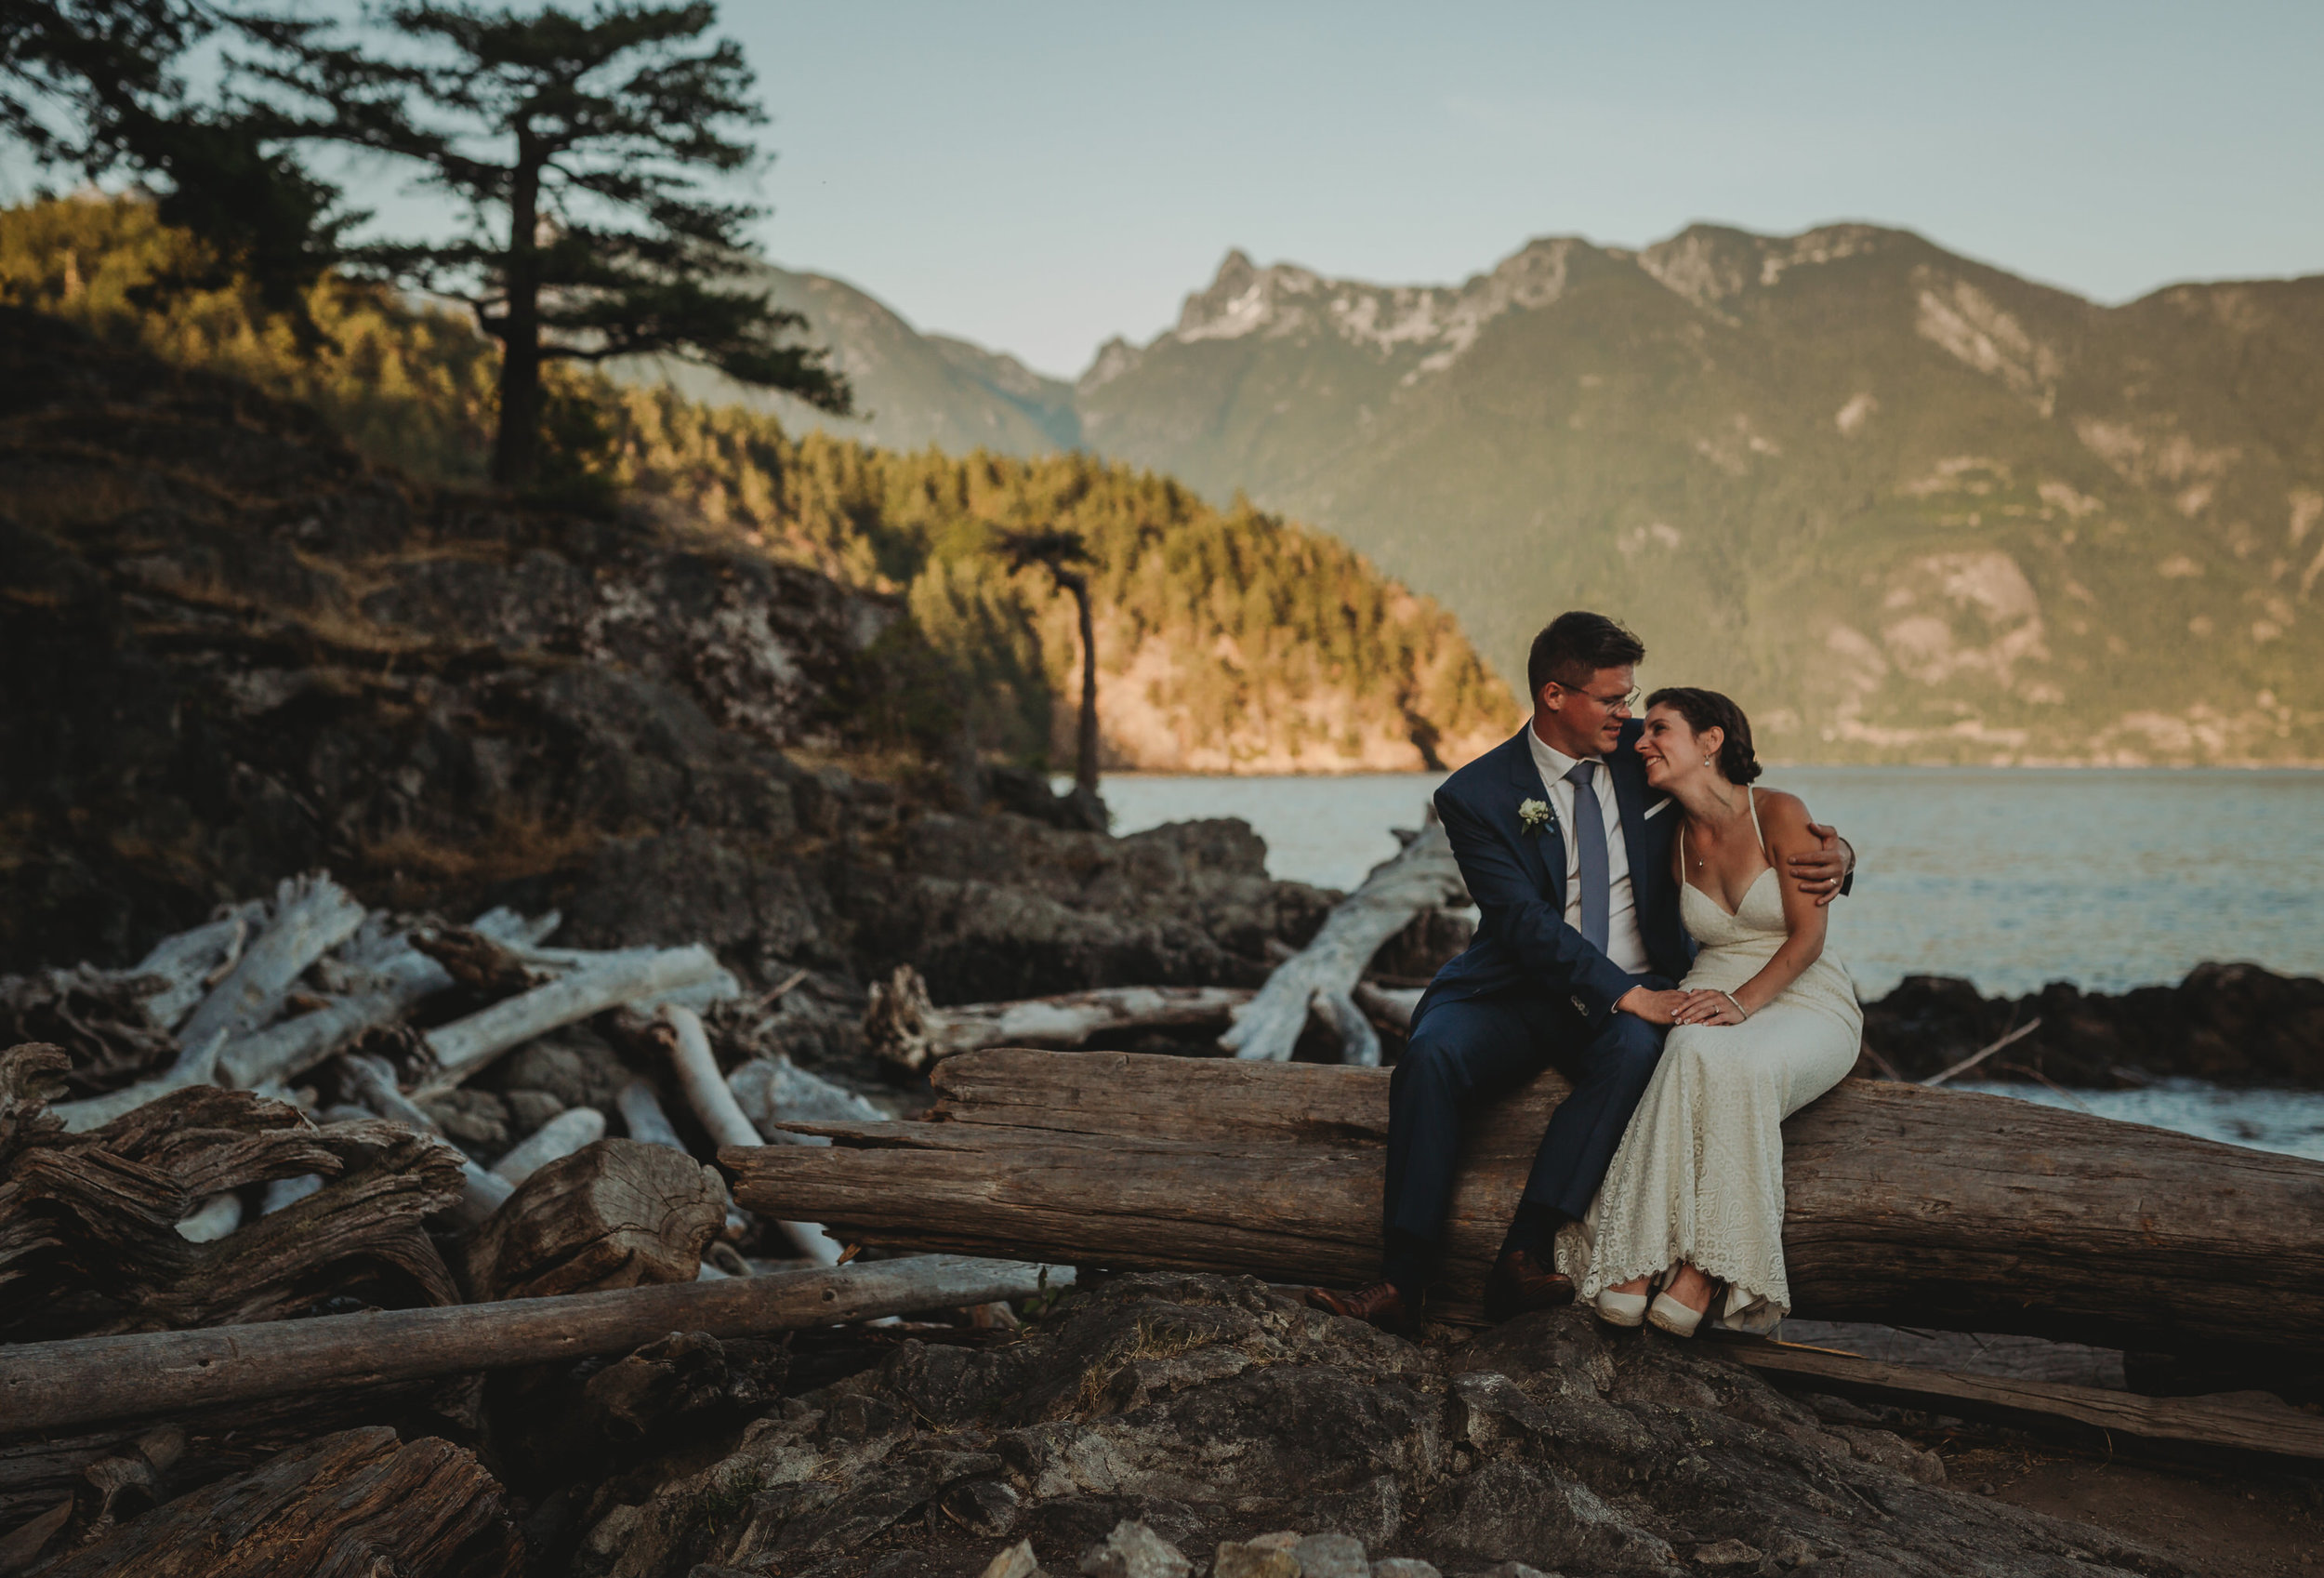 Camp Fircom Wedding - Vancouver Wedding Photographer & Videographer - Sunshine Coast Wedding Photos - Sunshine Coast Wedding Photographer - Jennifer Picard Photography - IMG_1254.jpg